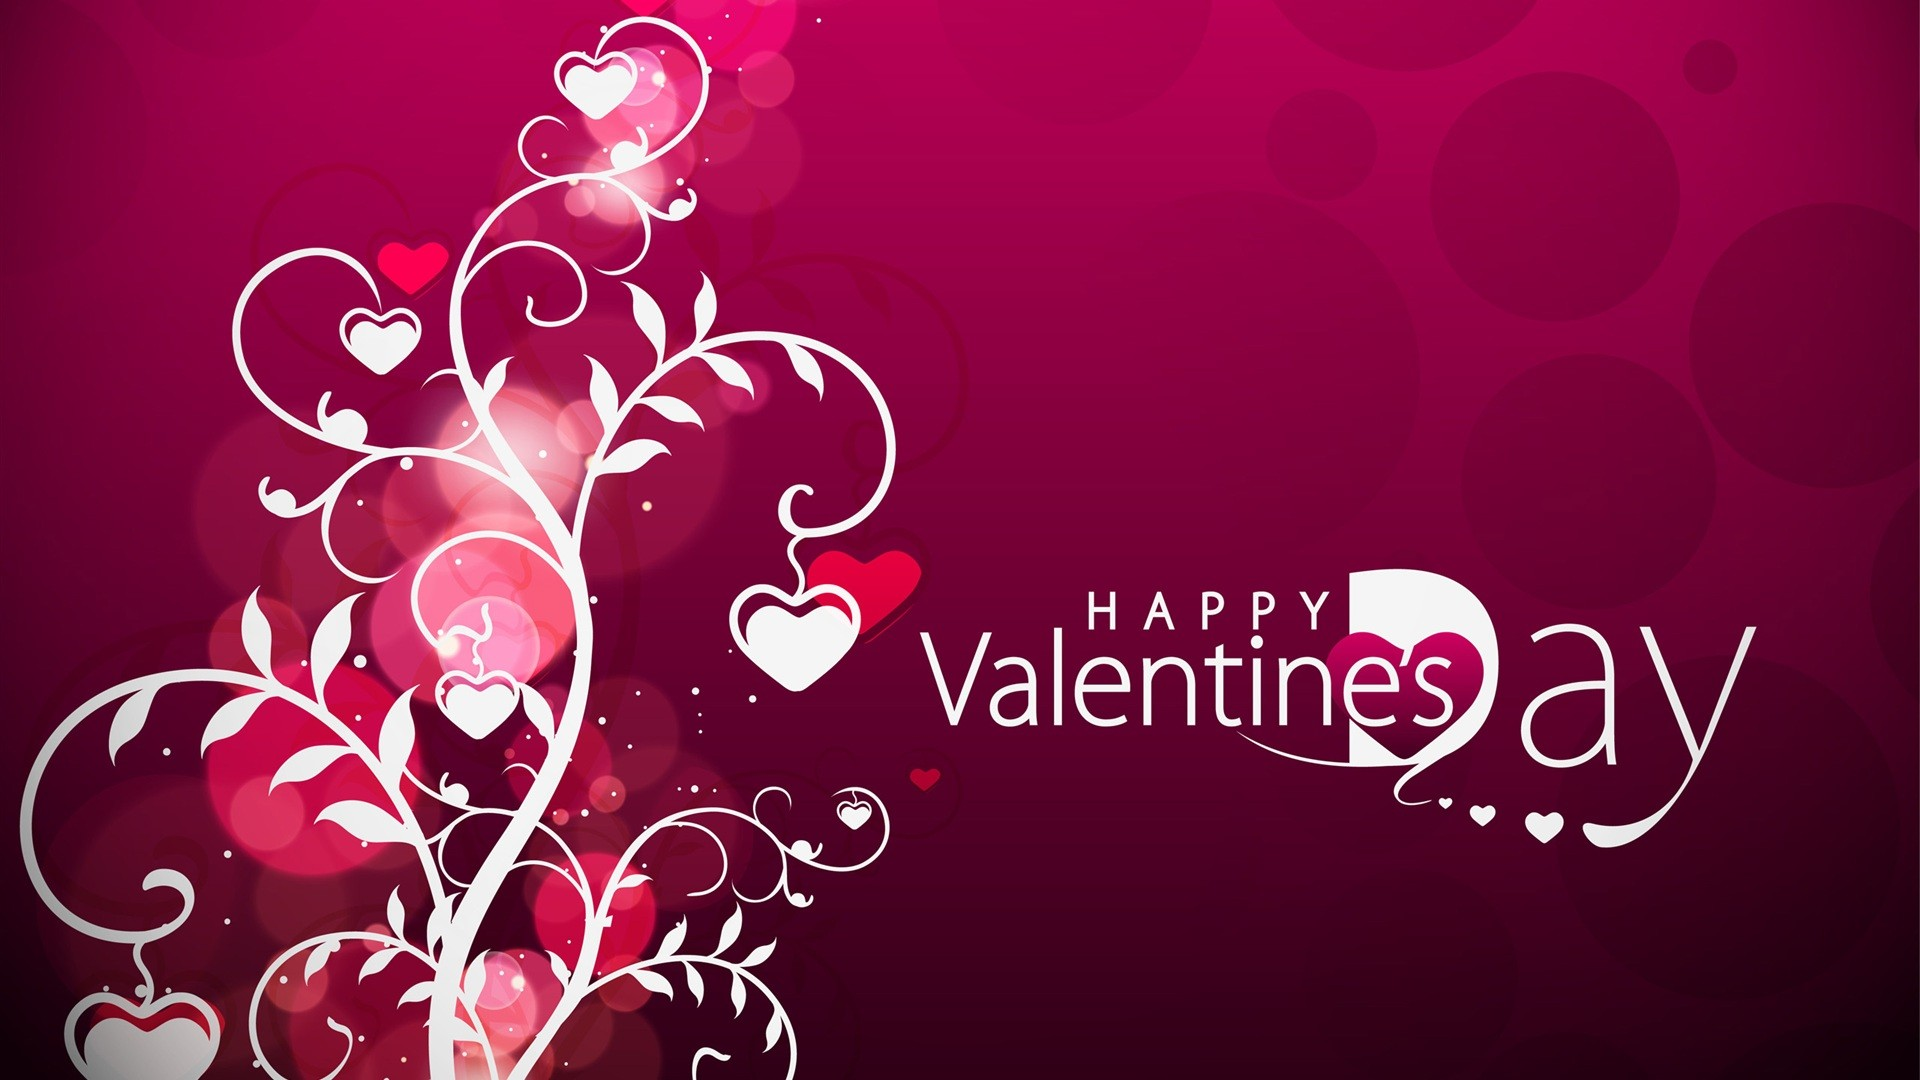 happy-valentines-day-wallpaper-1